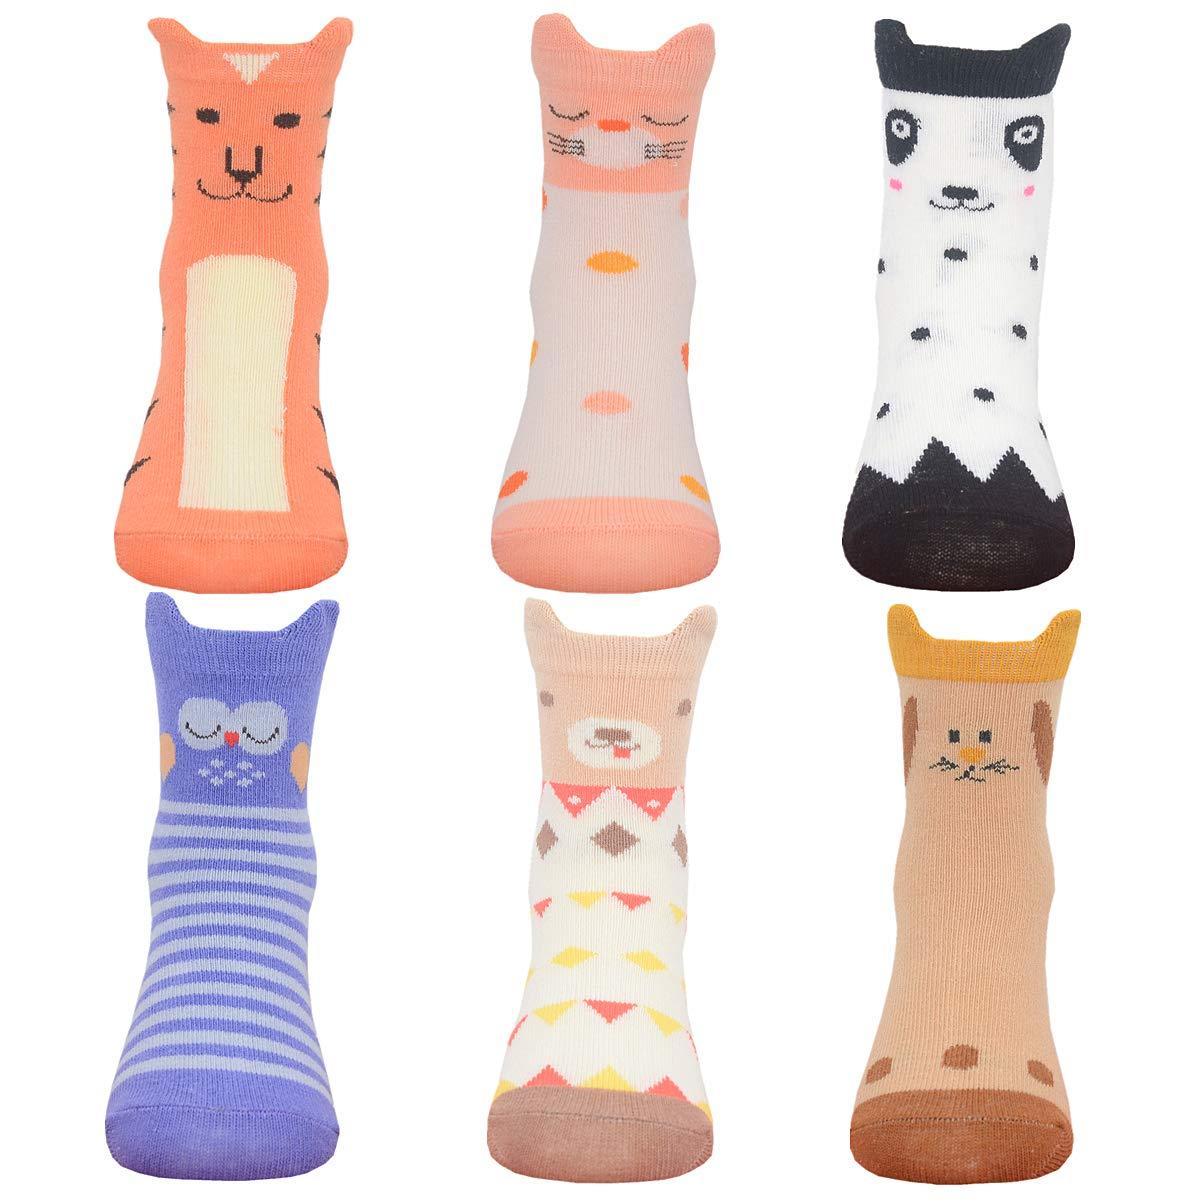 Nuziku Baby Toddler Girls Crew Grip Socks Anti Slip Non Skid Animal Cotton Stockings 6 Pairs